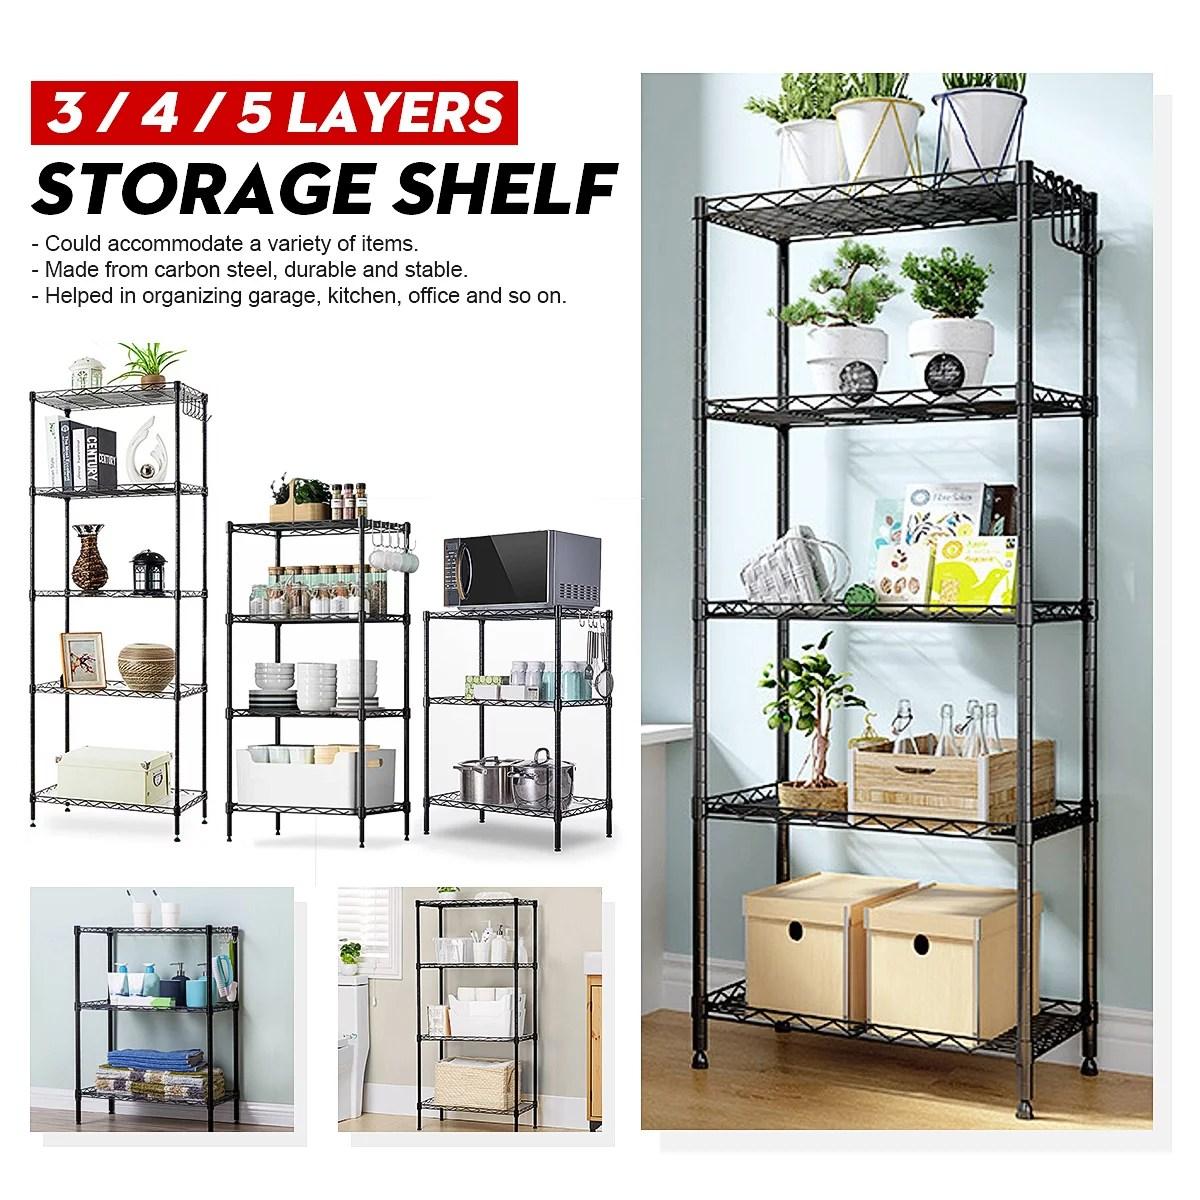 steel wire shelving unit heavy duty metal shelves shelf organizer rack for home office garage